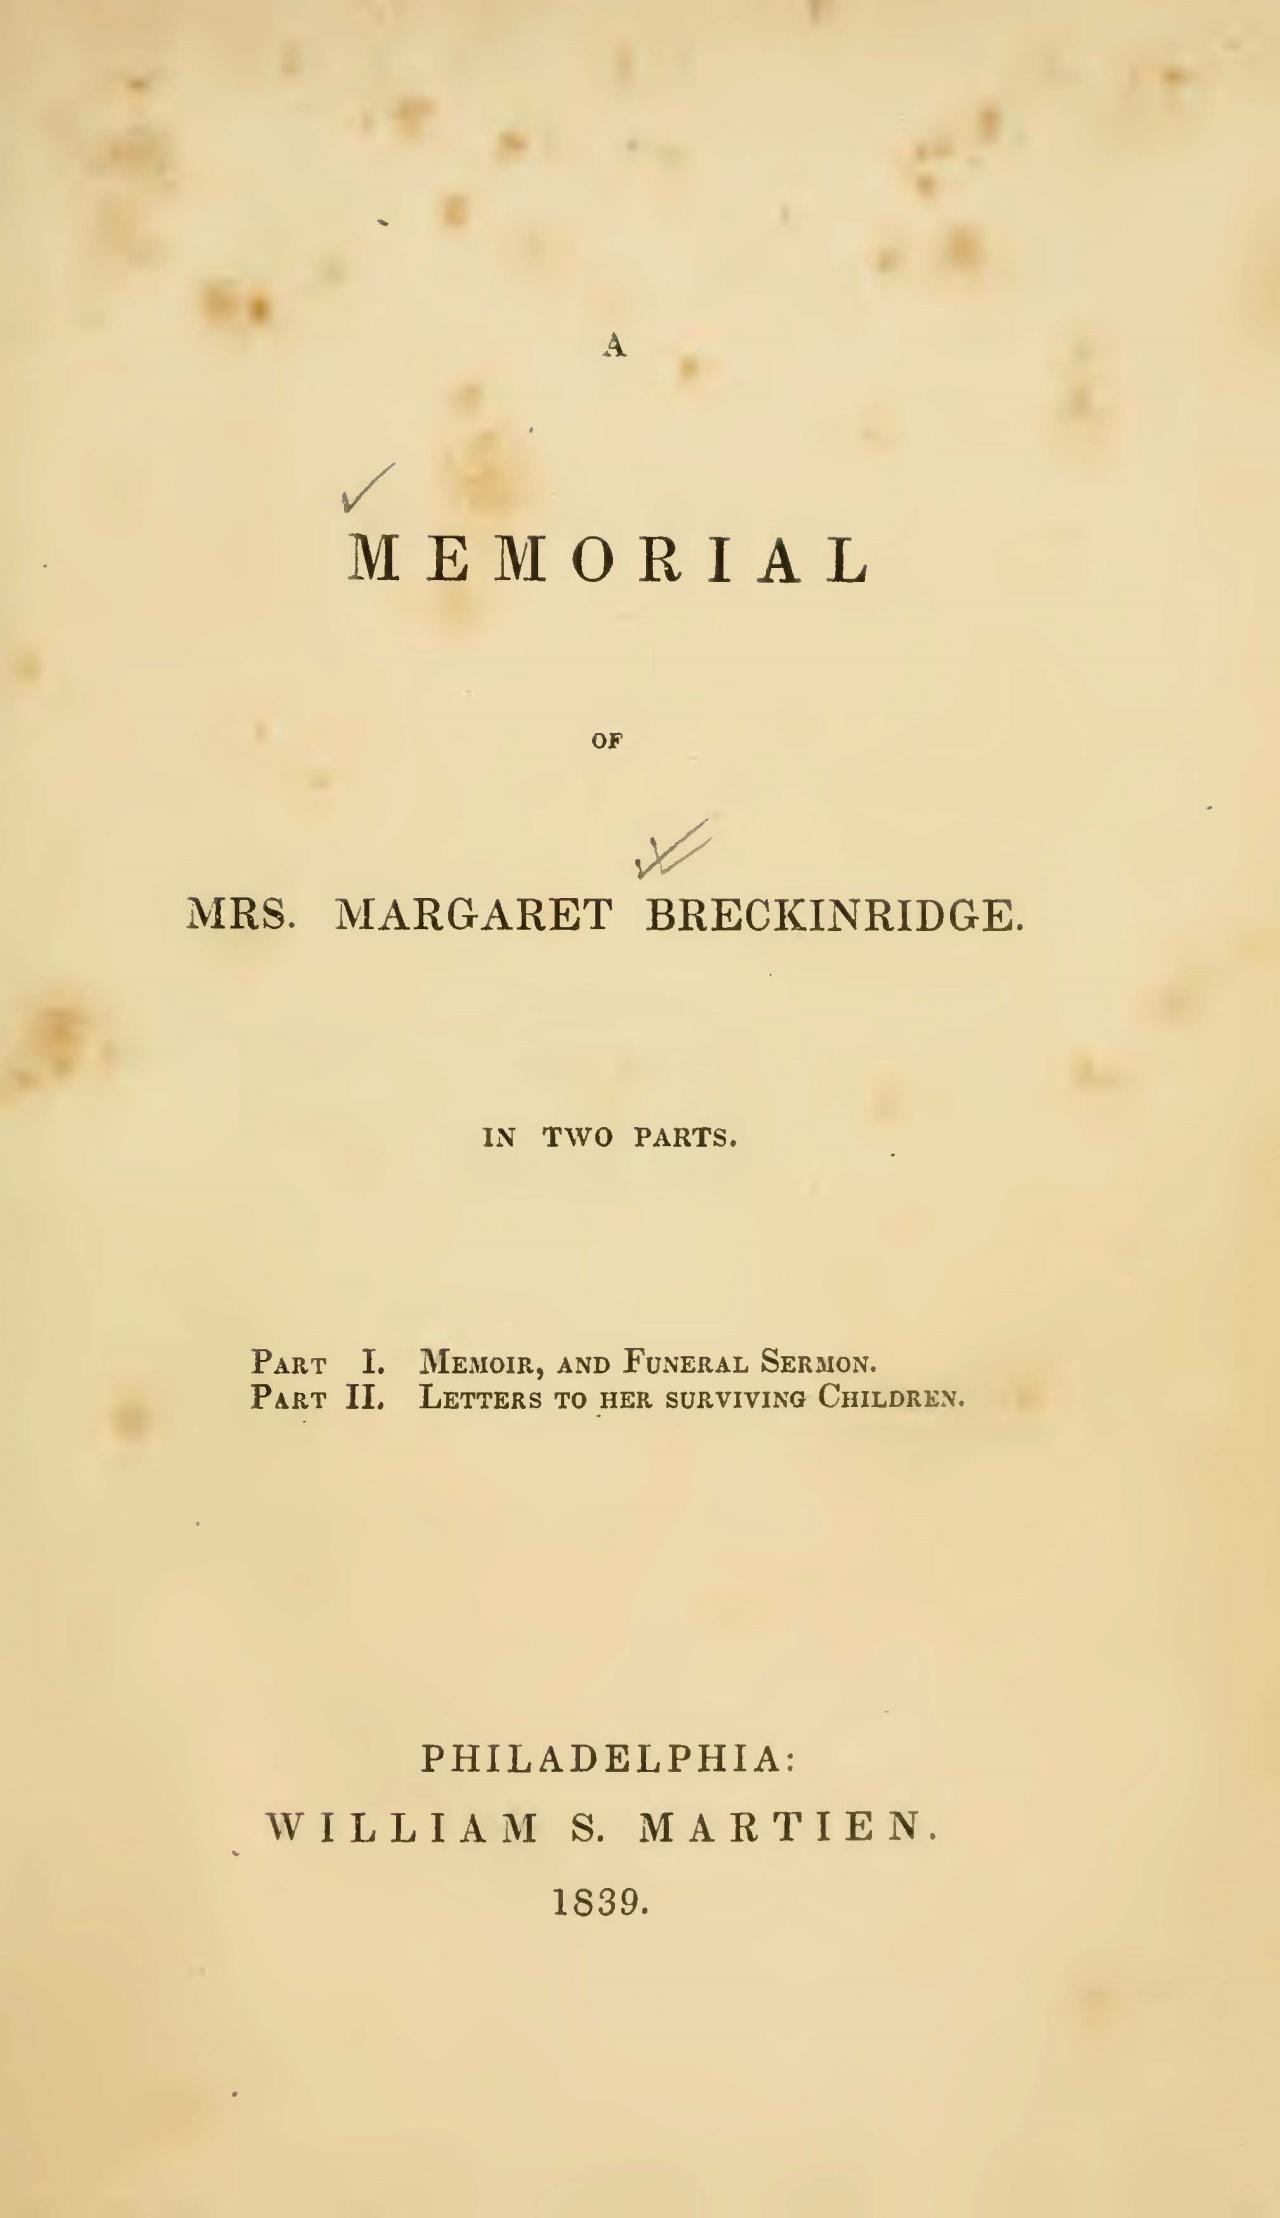 Alexander, Archibald, A Memorial of Mrs. Margaret Breckinridge Title Page.jpg